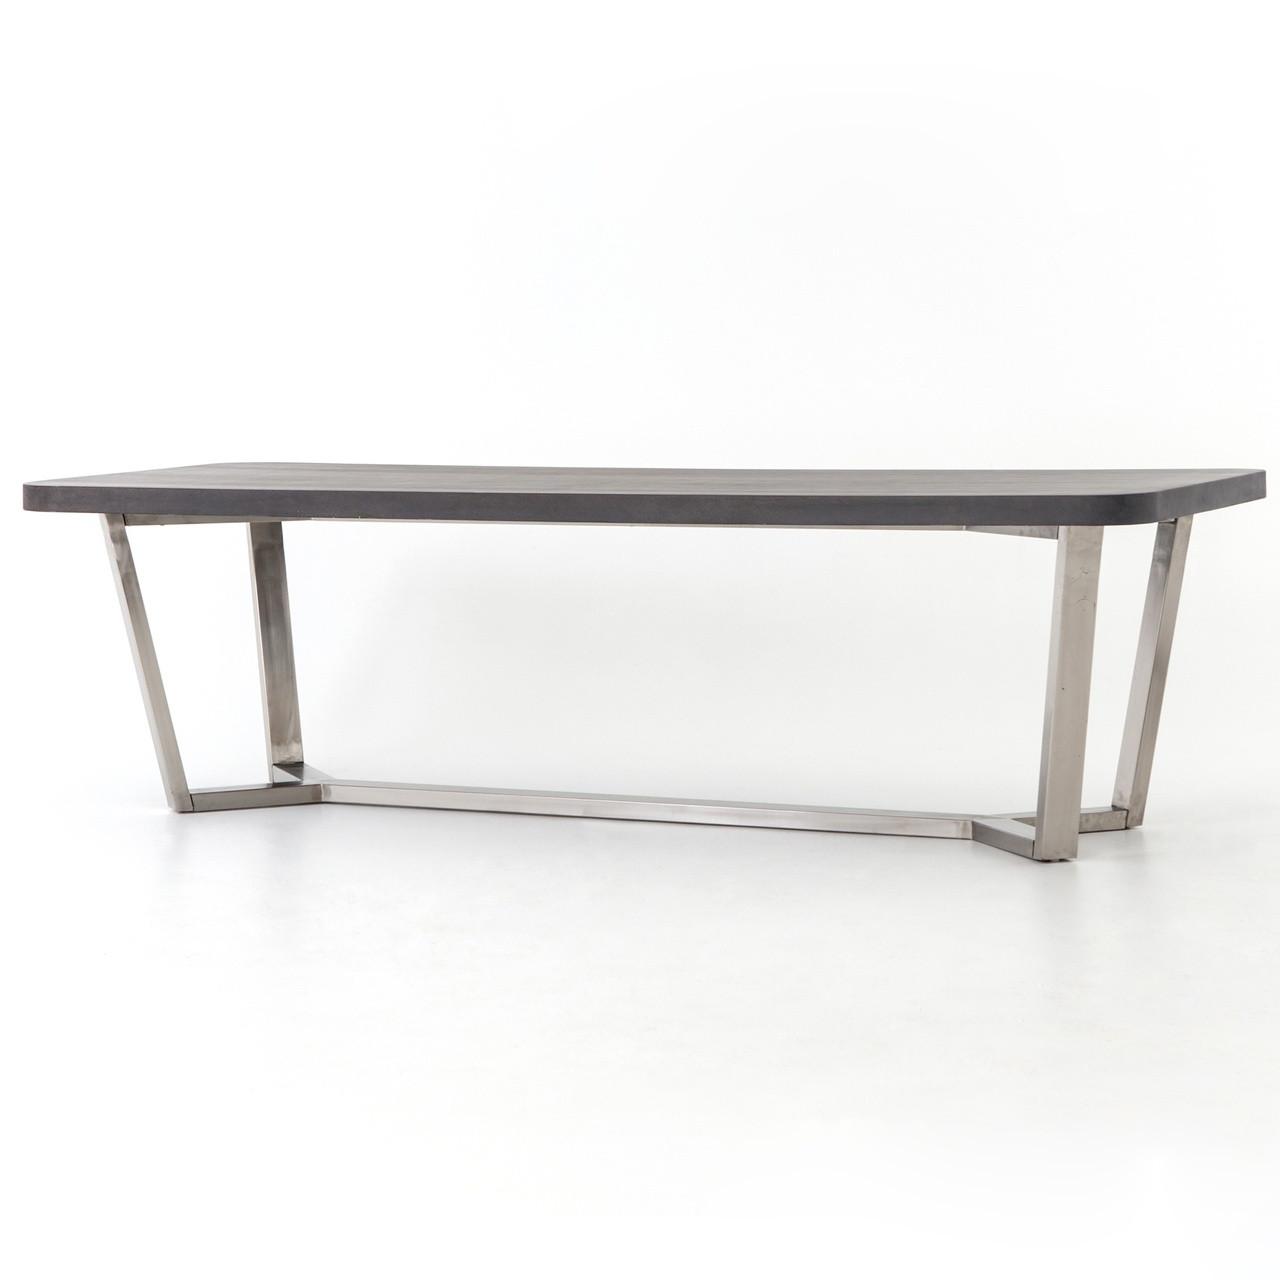 Ashton Lavastone Top Stainless Steel Legs Dining Table